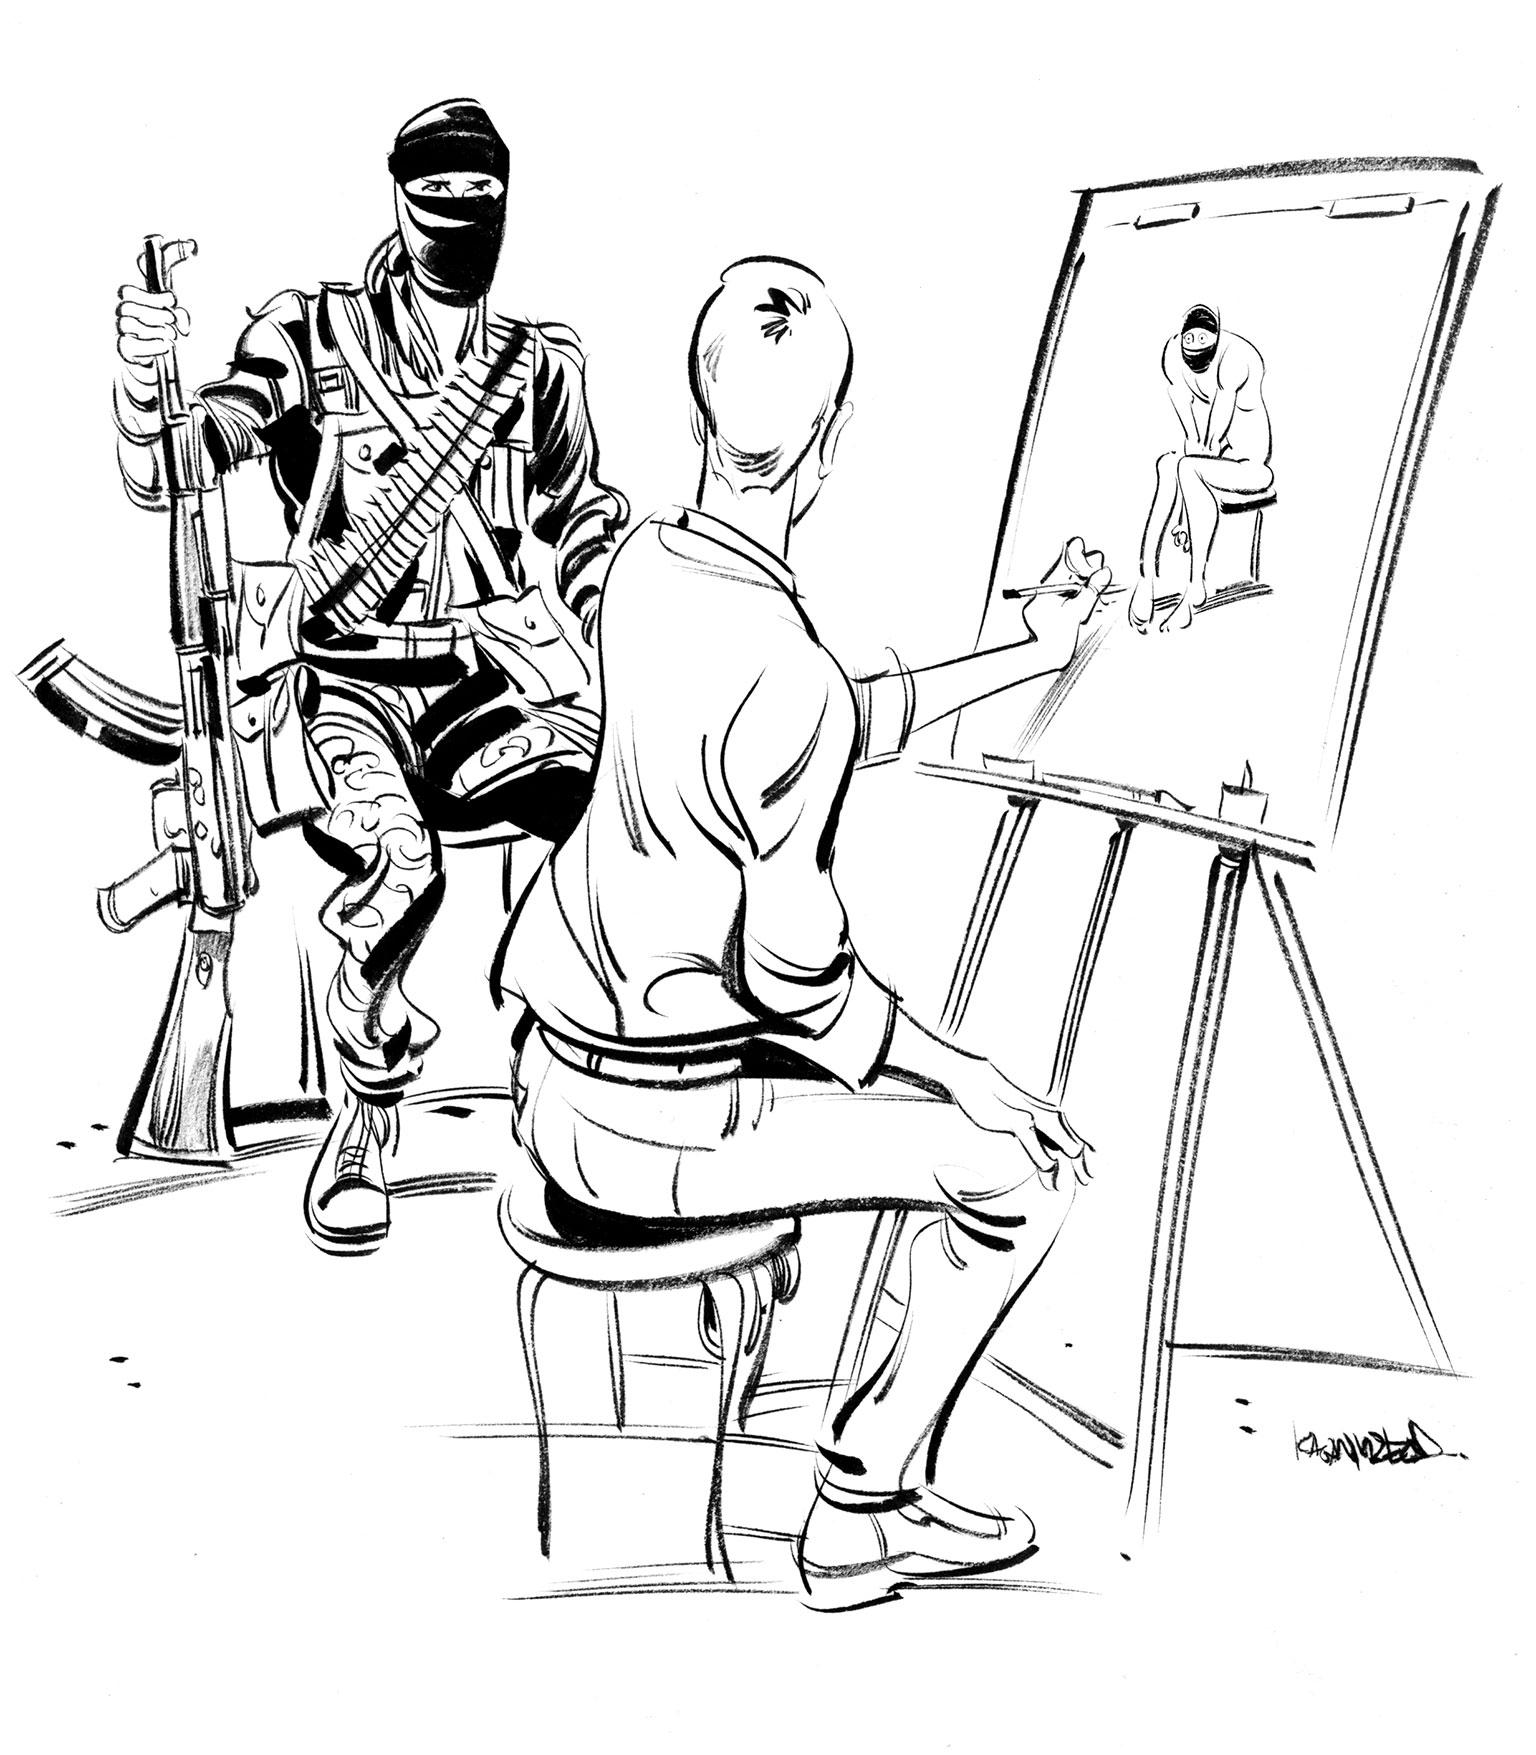 Illustration by Kagan McLeod